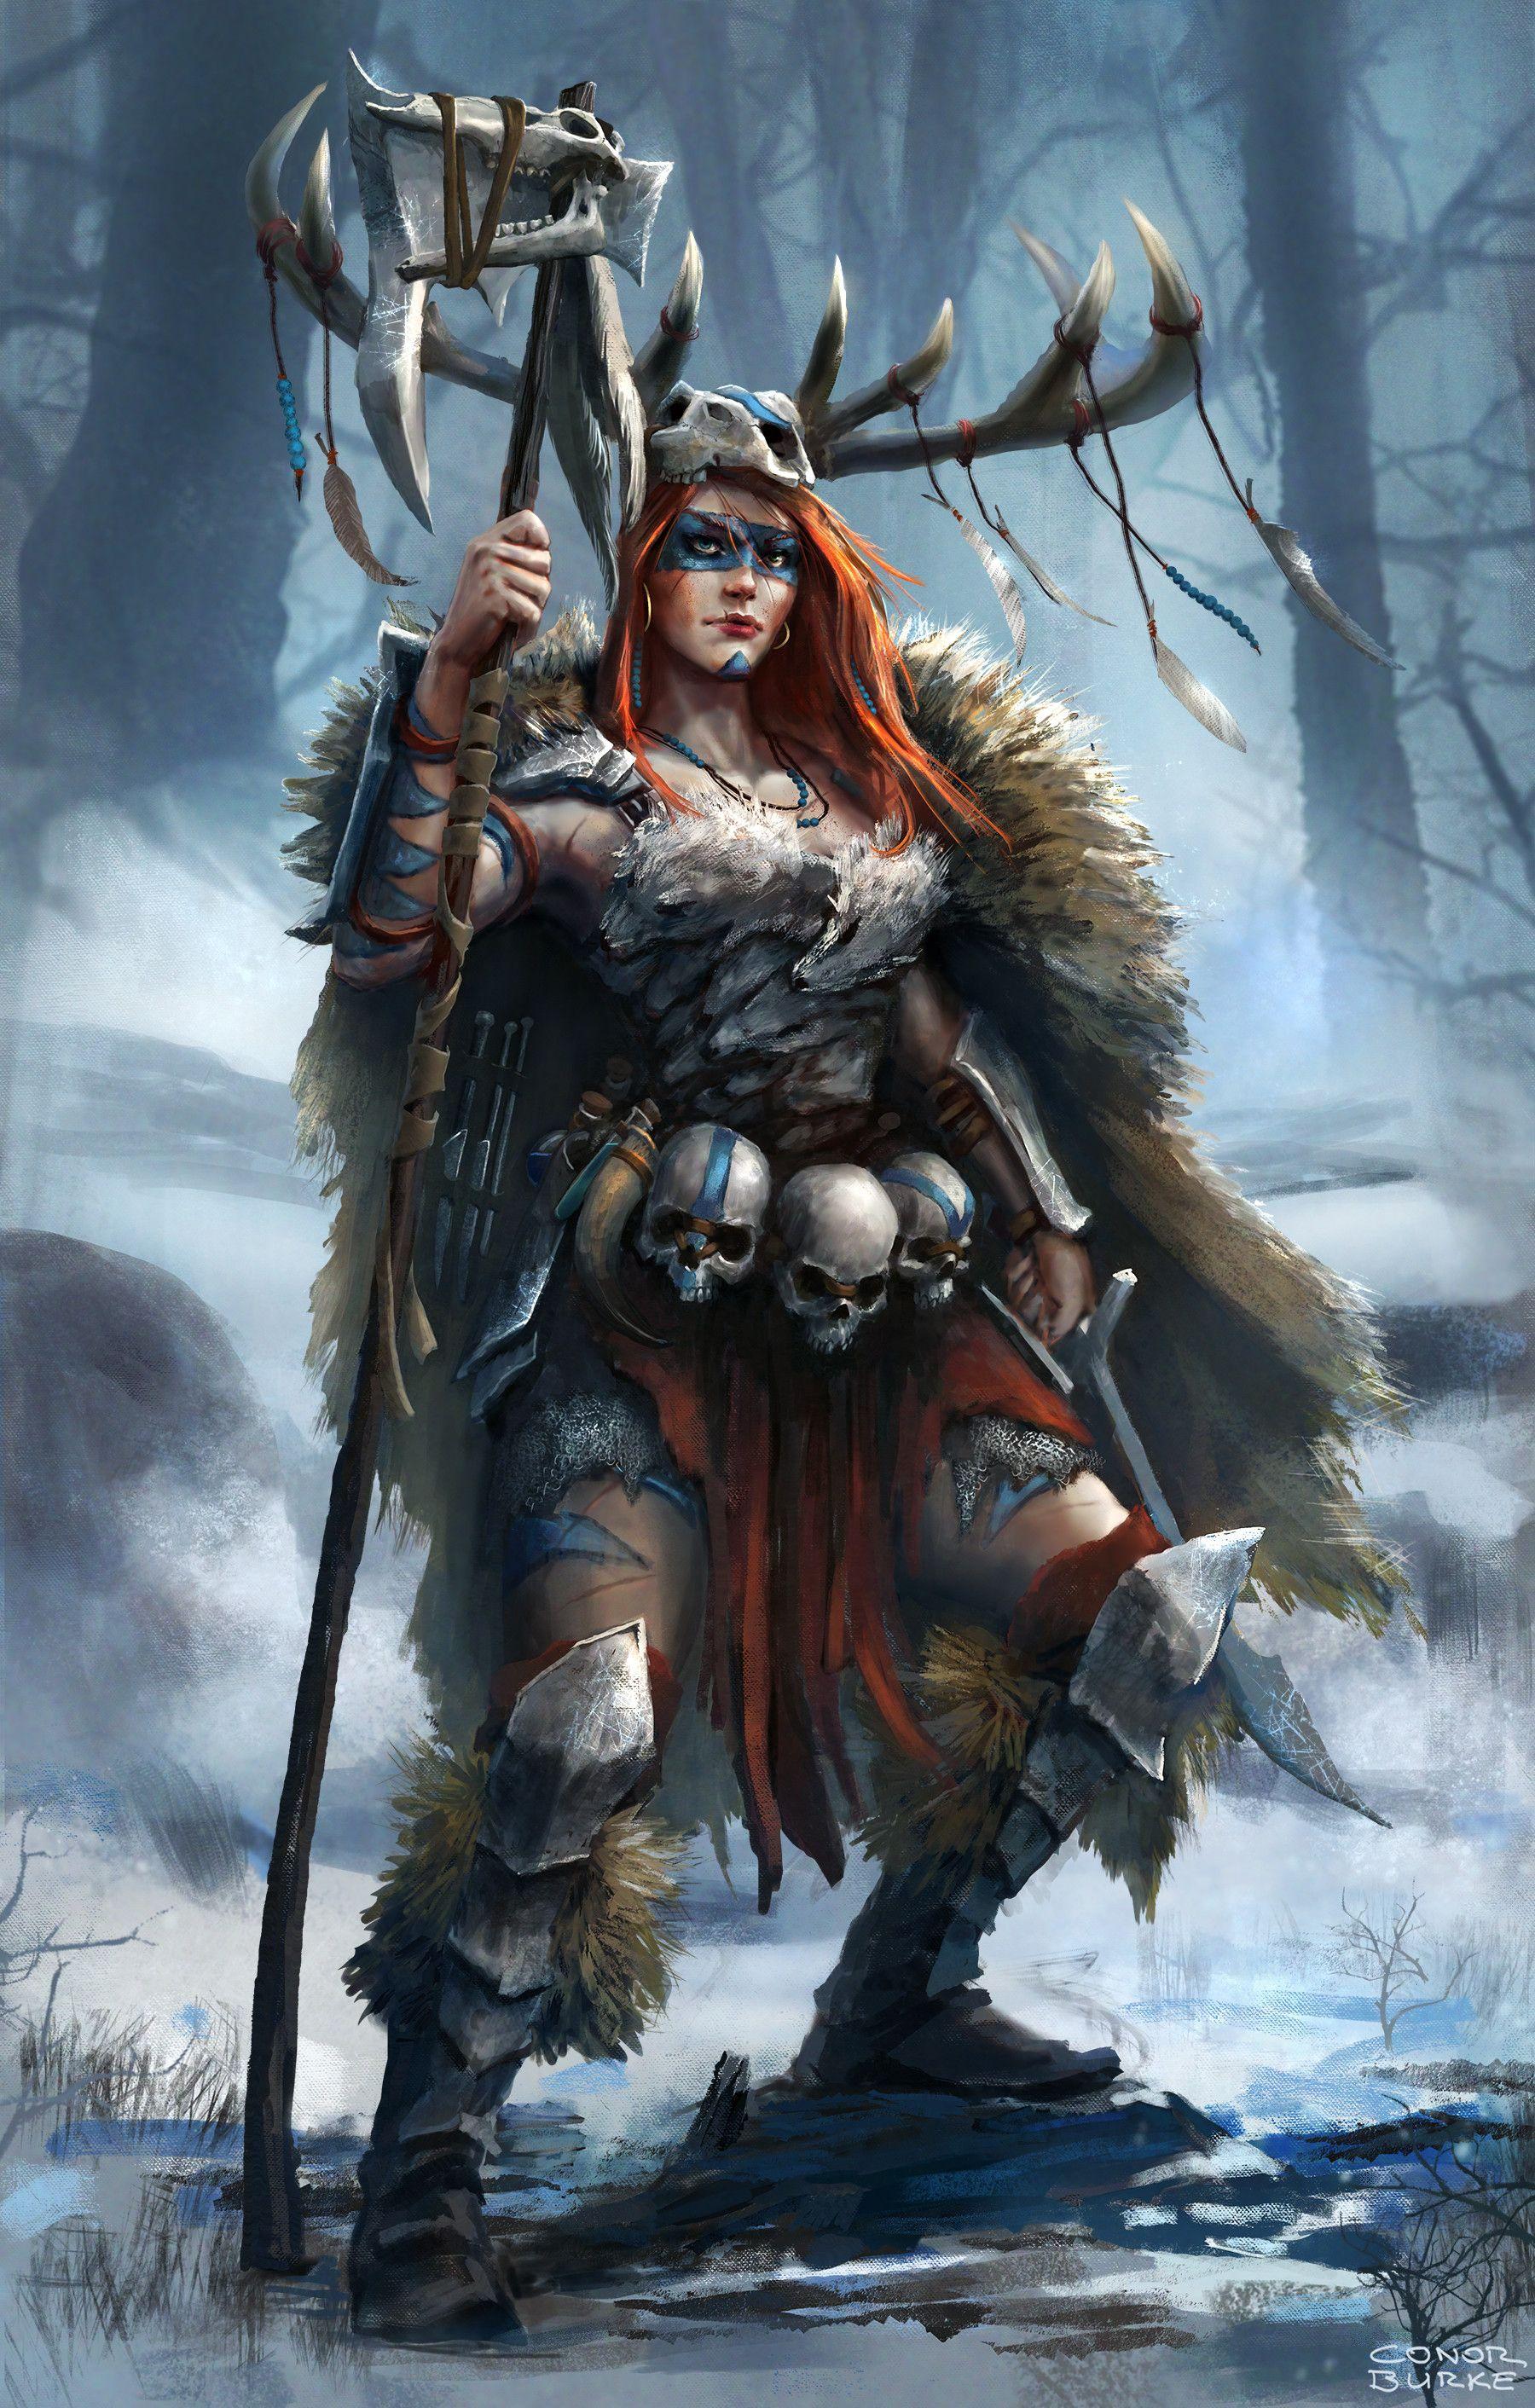 Artstation battle shaman conor burke female warriors - Fantasy female warrior artwork ...